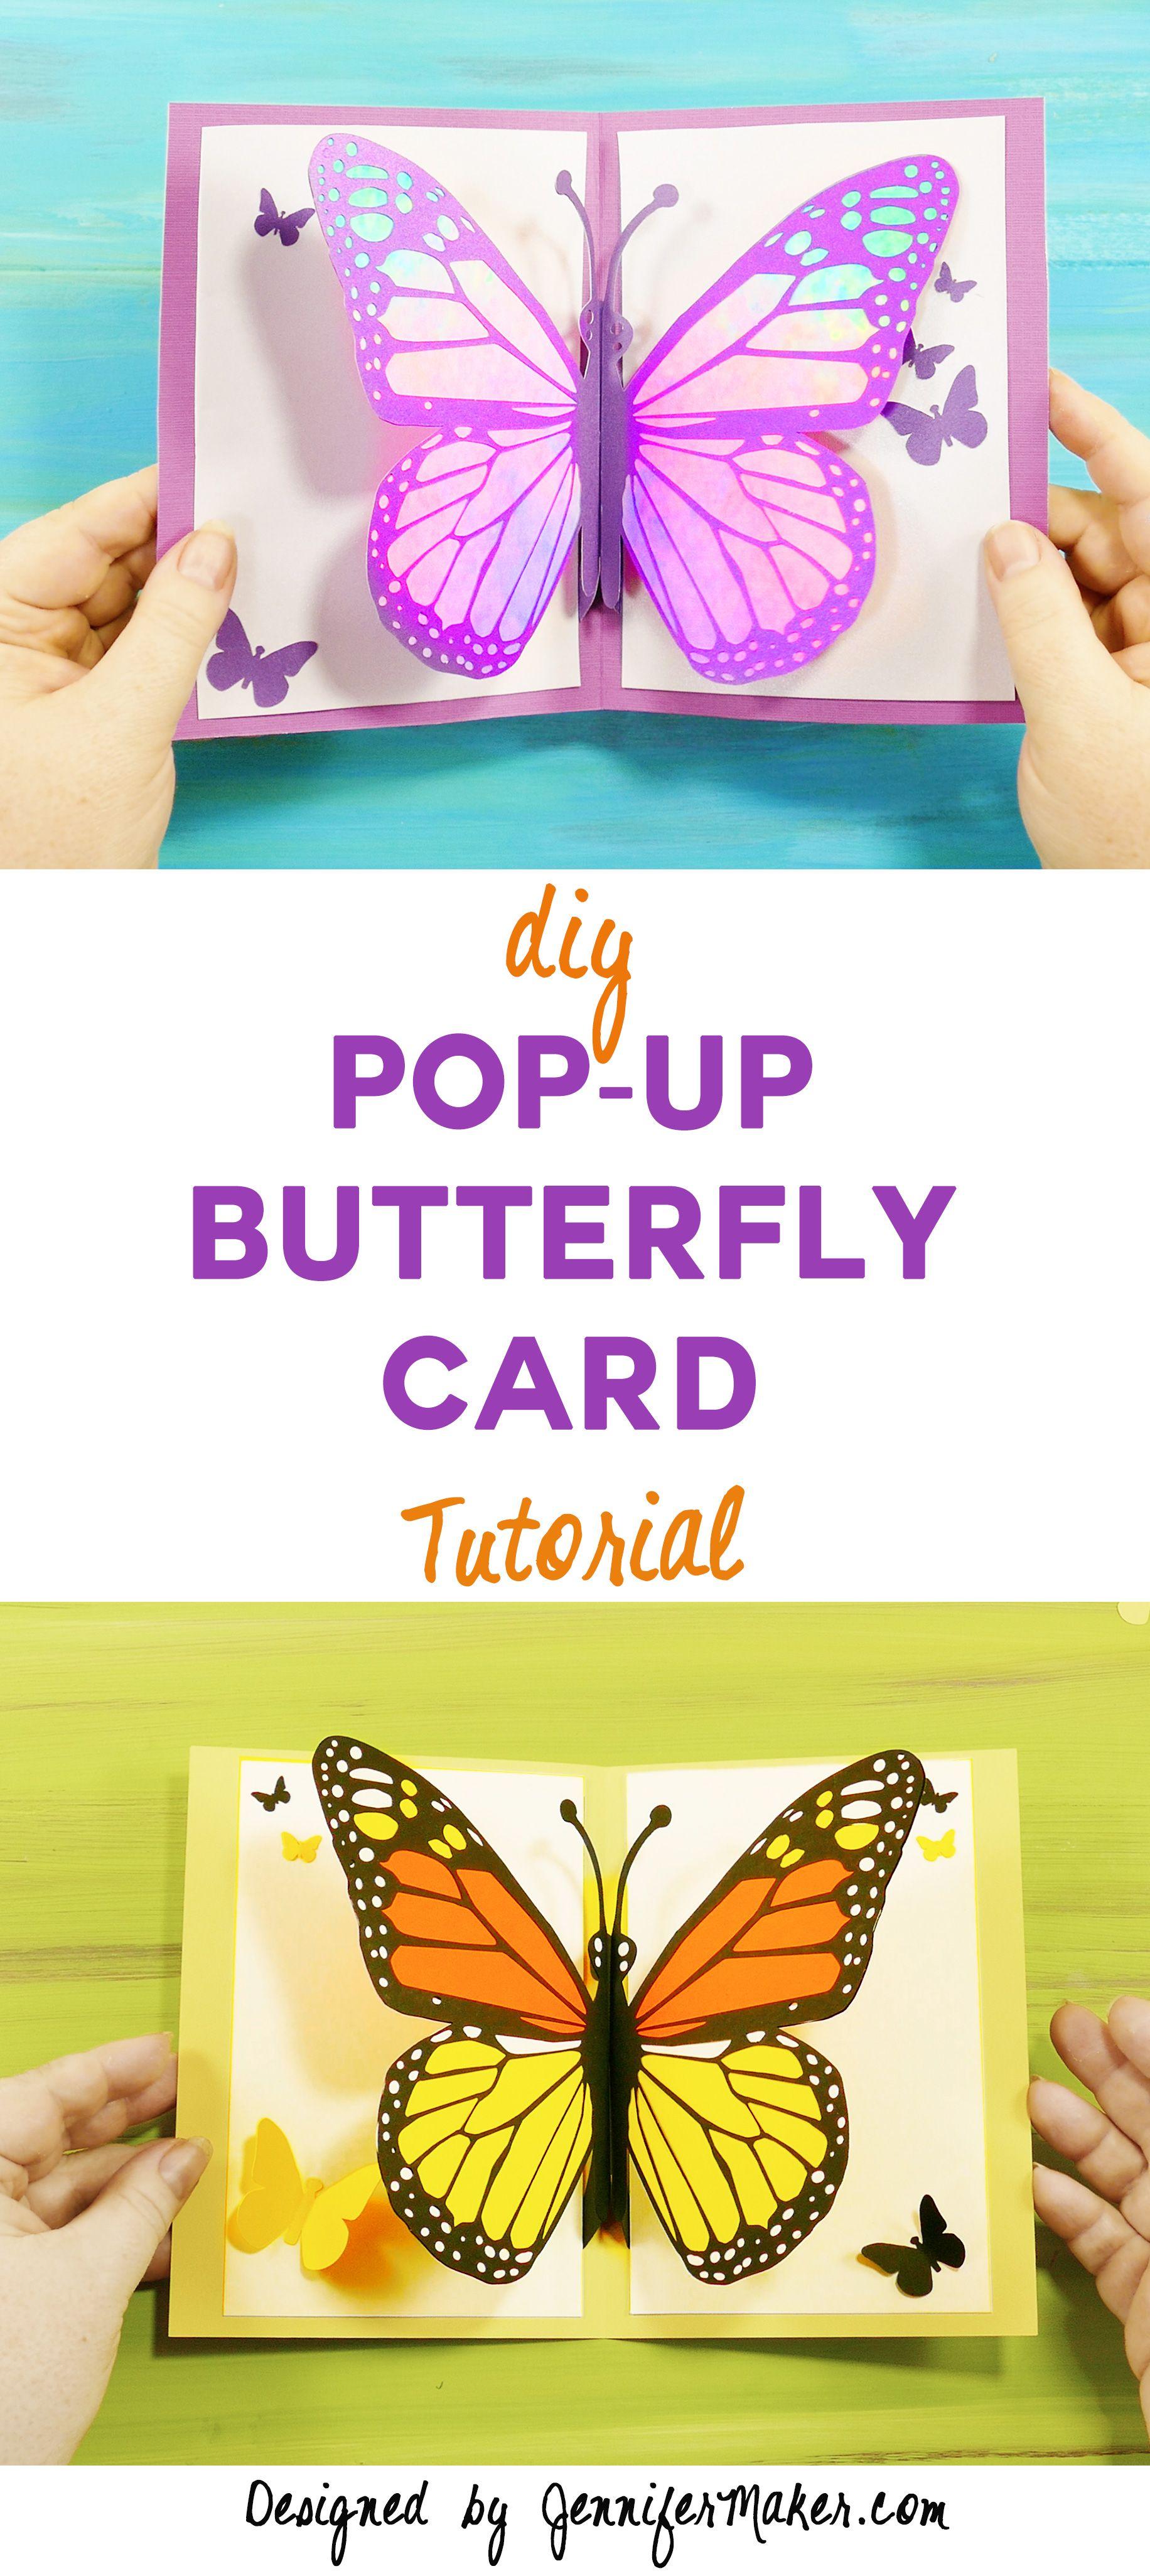 Easy Butterfly Card Diy Pop Up Tutorial Jennifer Maker Diy Pop Up Cards Butterfly Cards Birthday Cards Diy